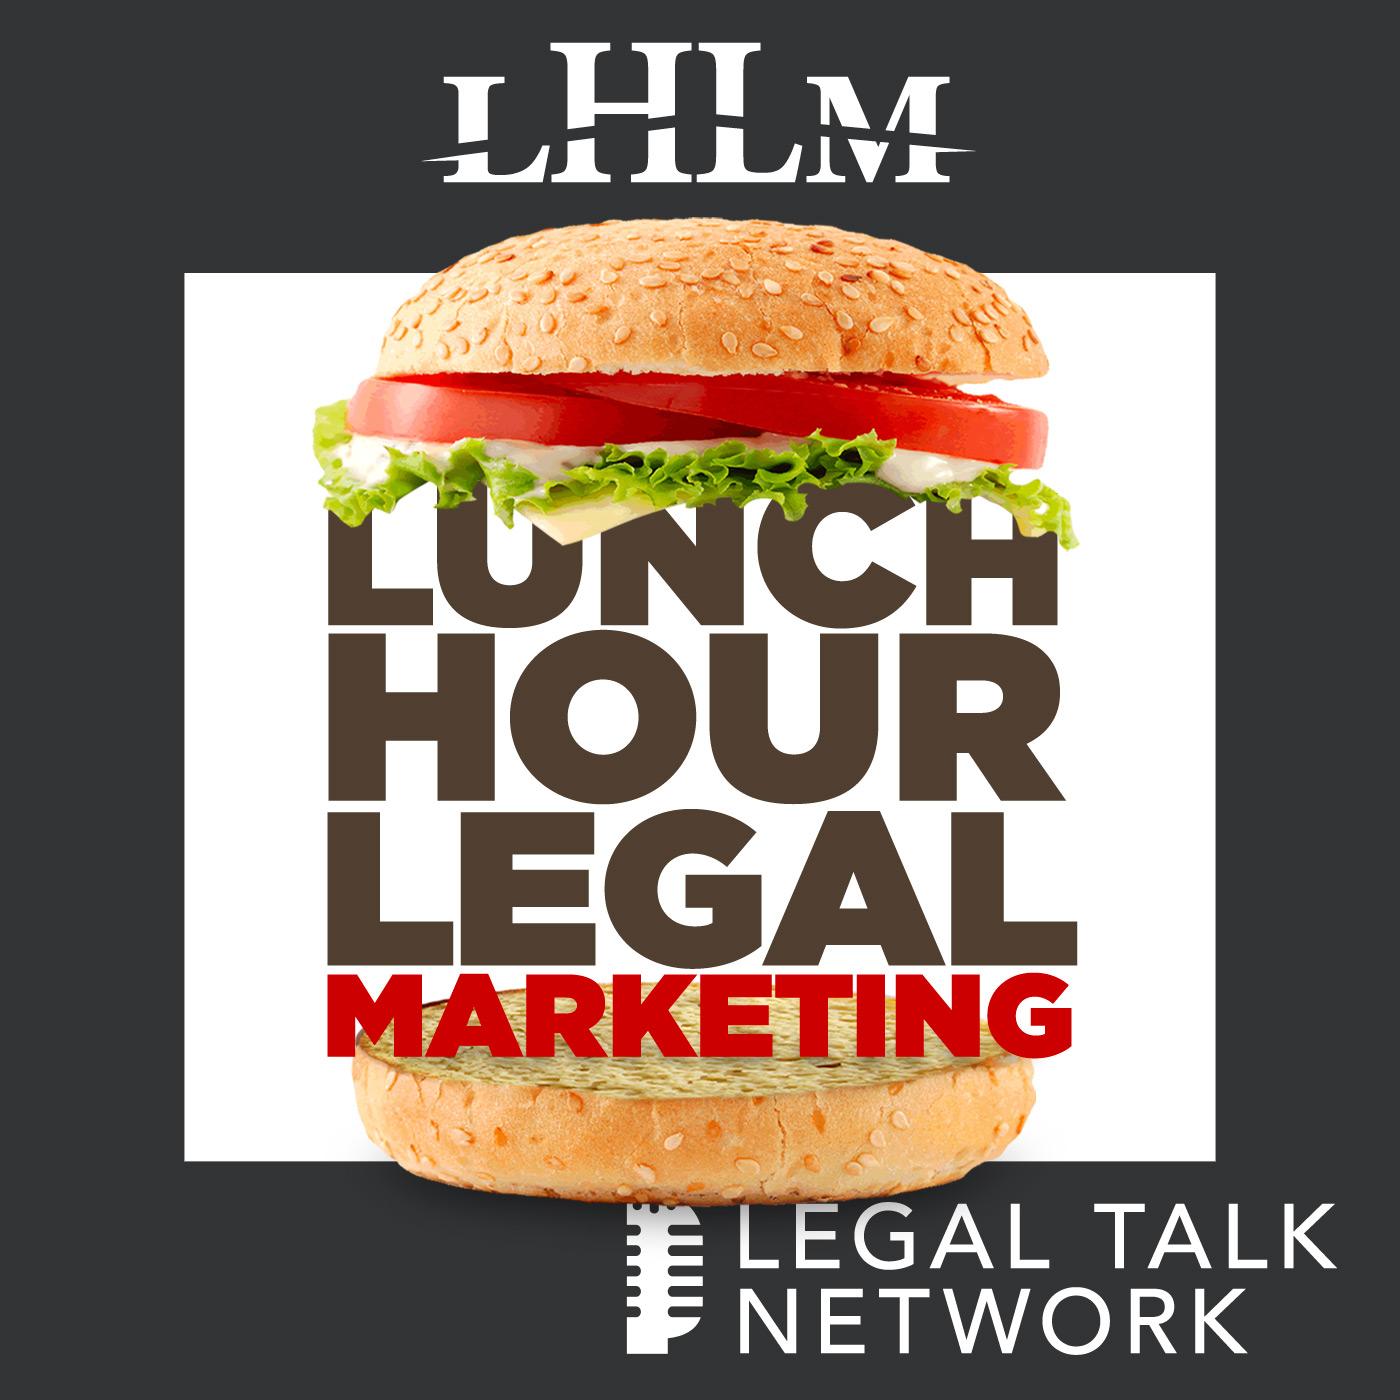 Lunch Hour Legal Marketing show art